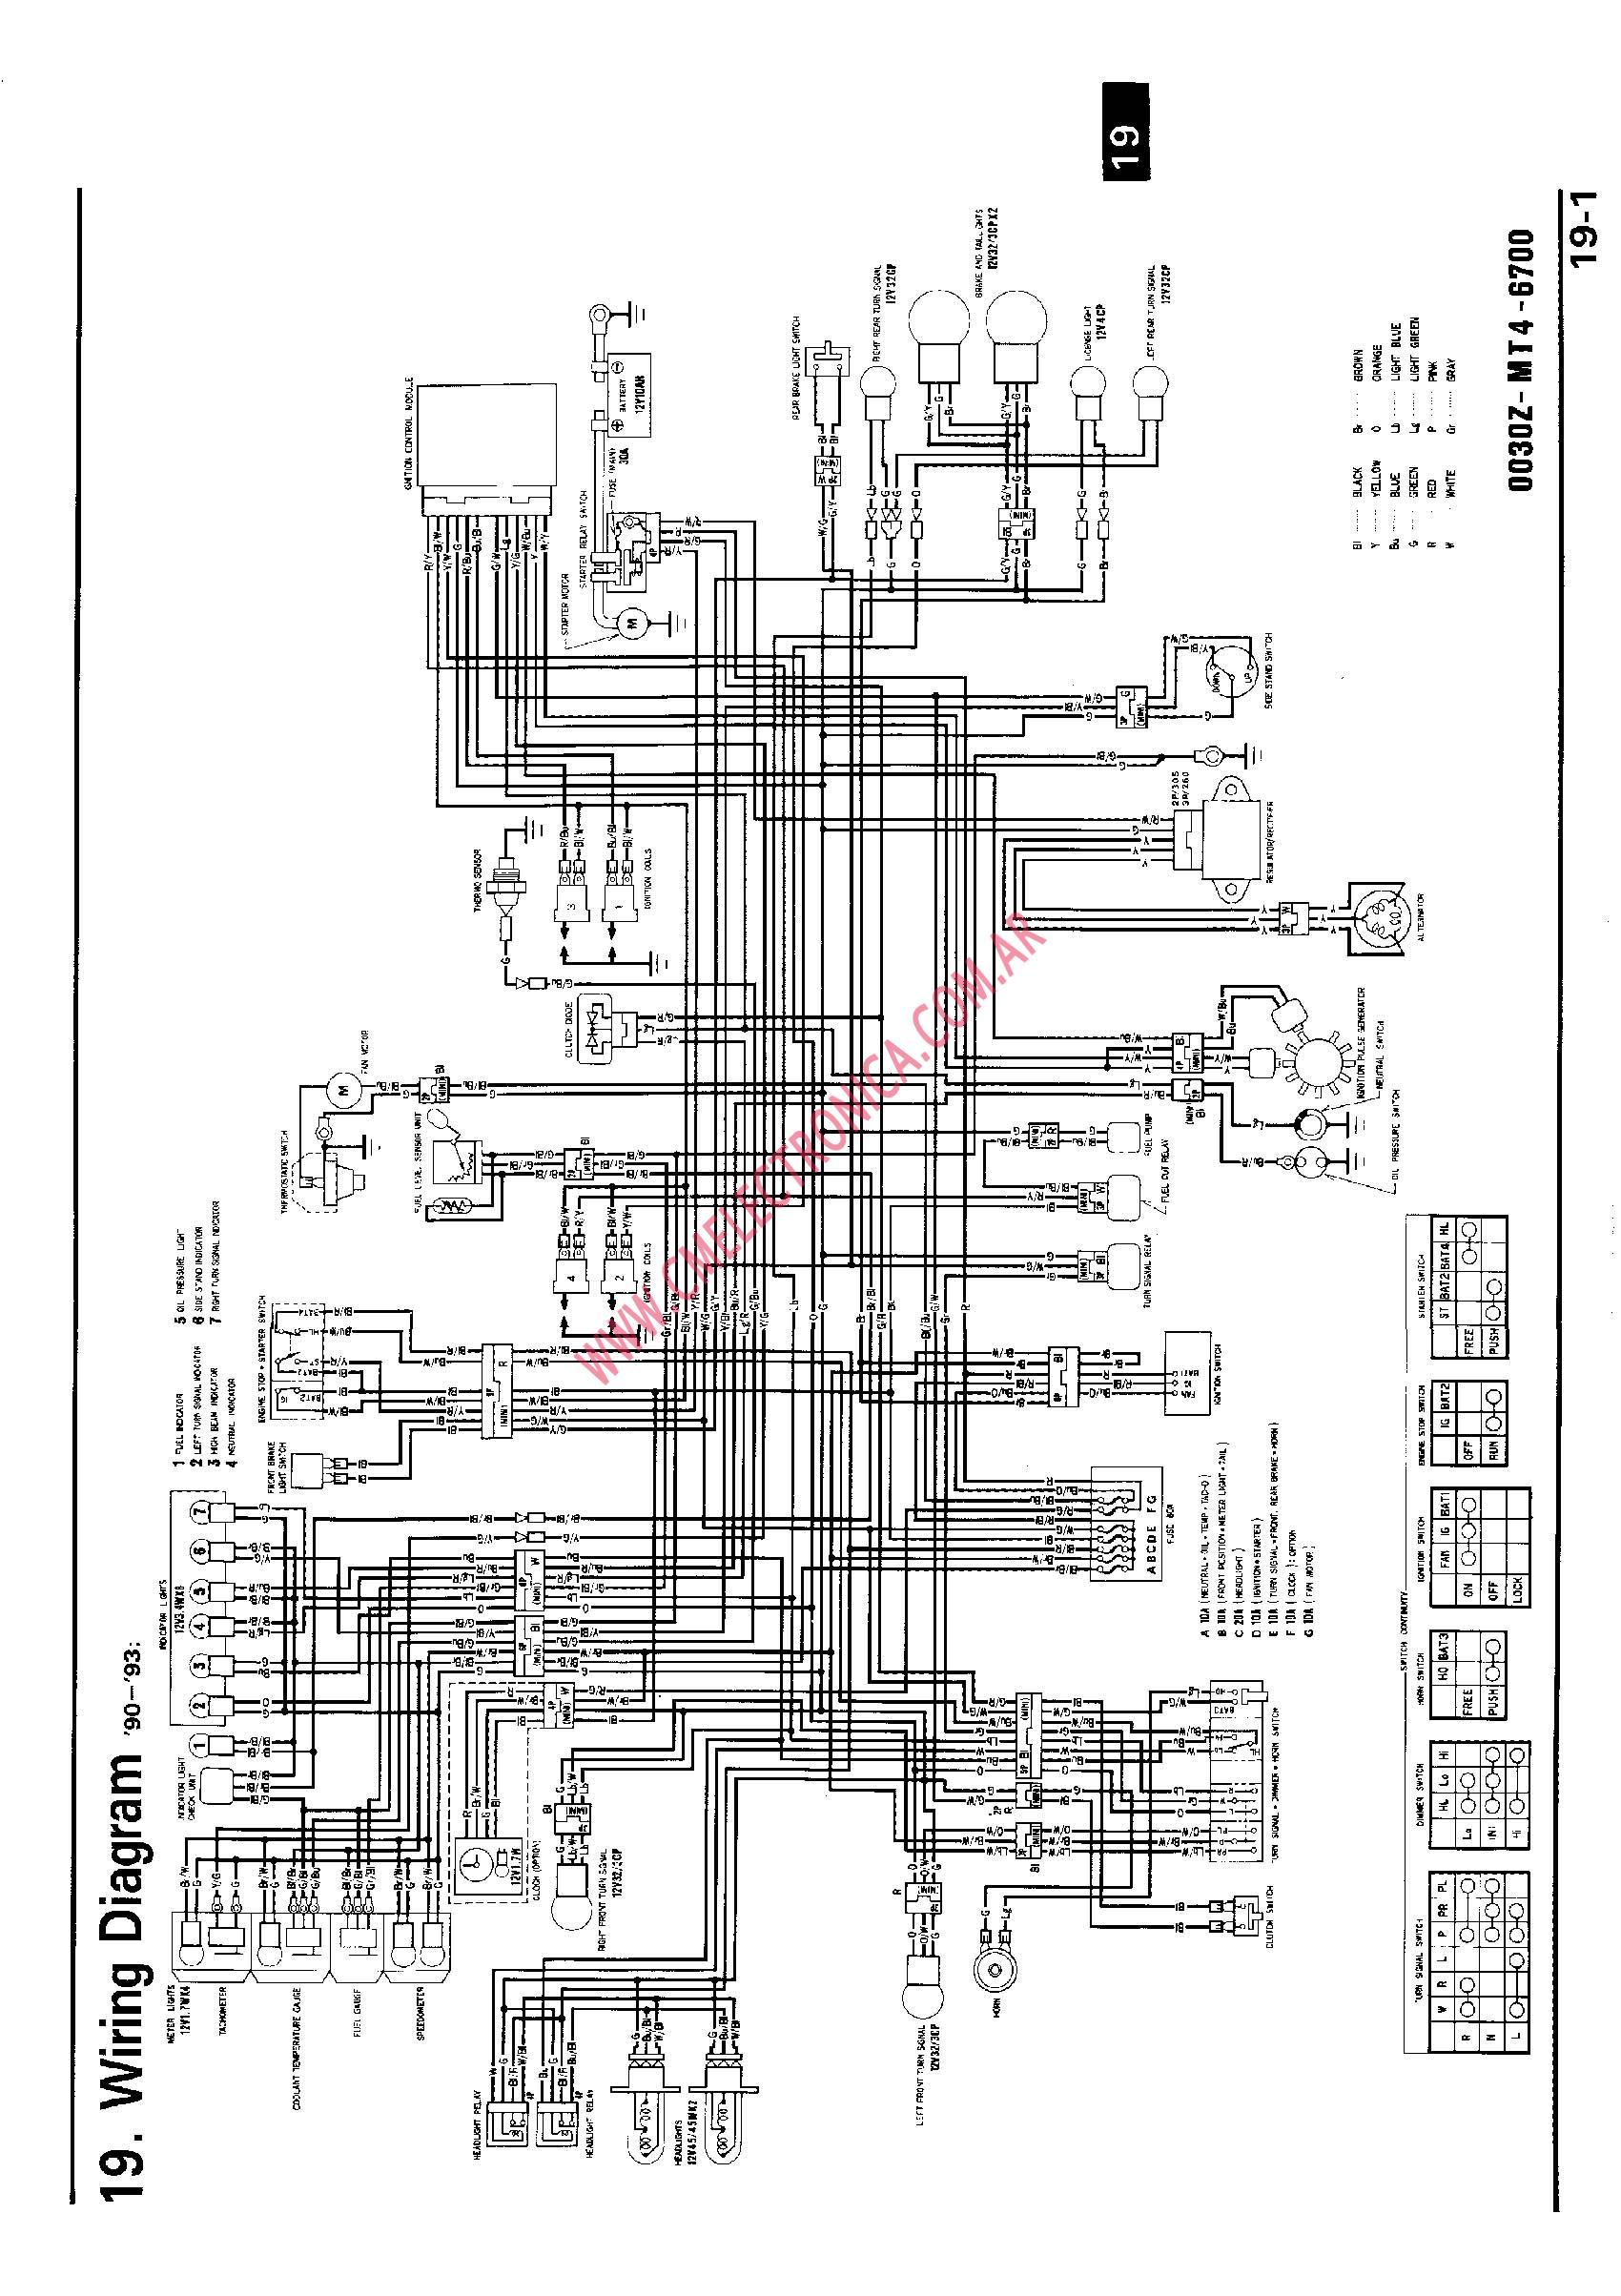 Honda Mt 50 Wiring Diagram : Honda zb wiring diagram imageresizertool